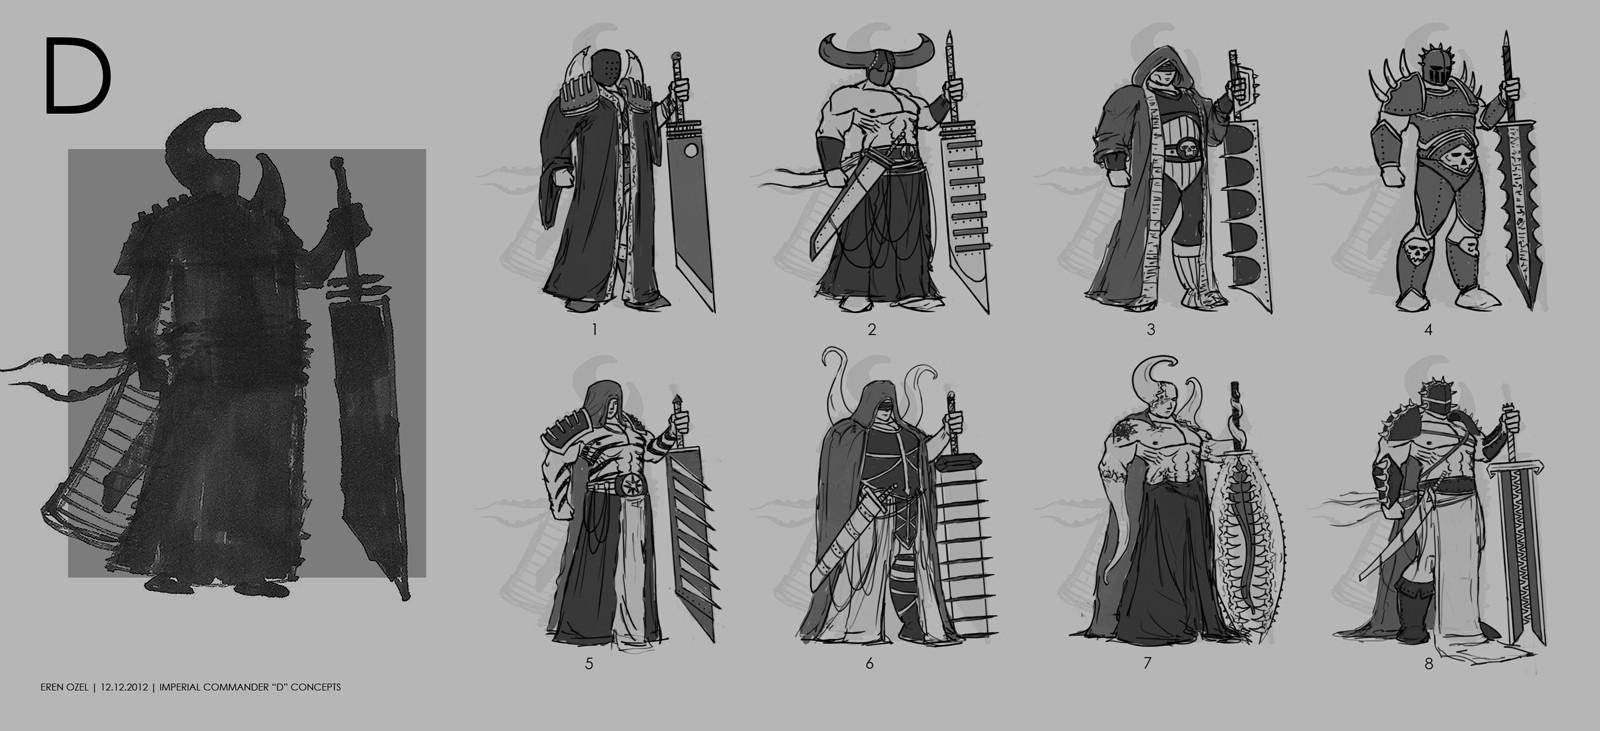 Eren ozel imperial commanders concepts d 1600x731